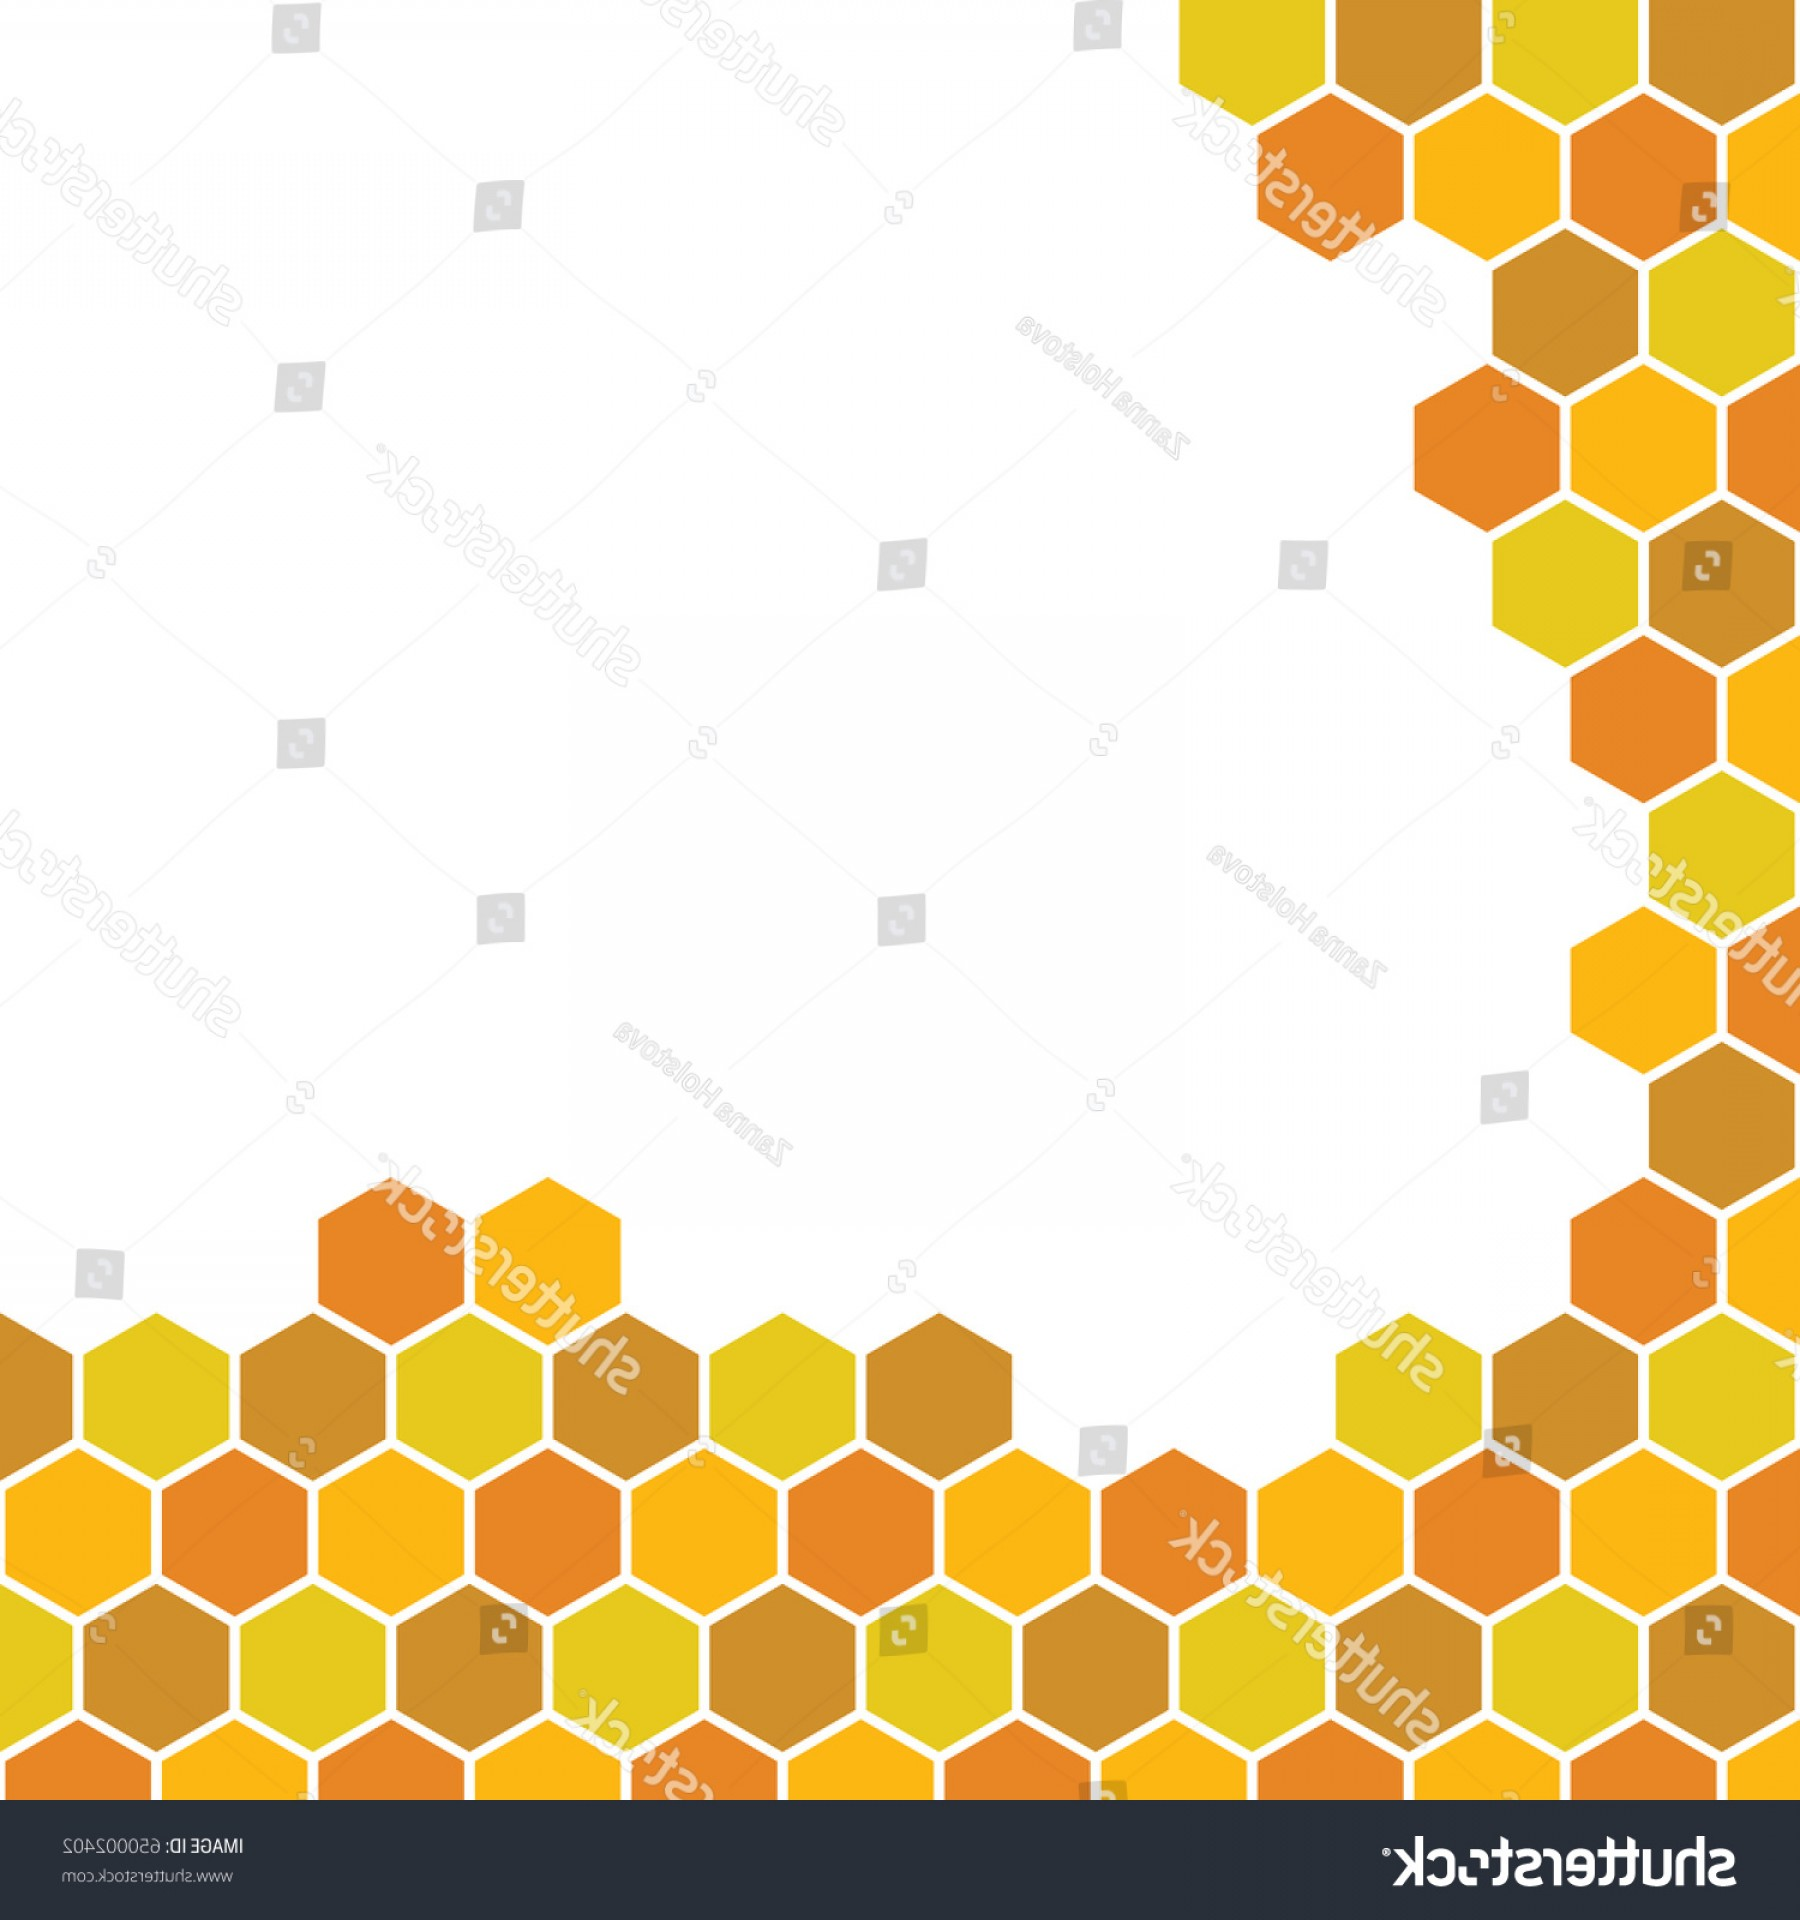 Honeycomb Pattern Vector At Getdrawings